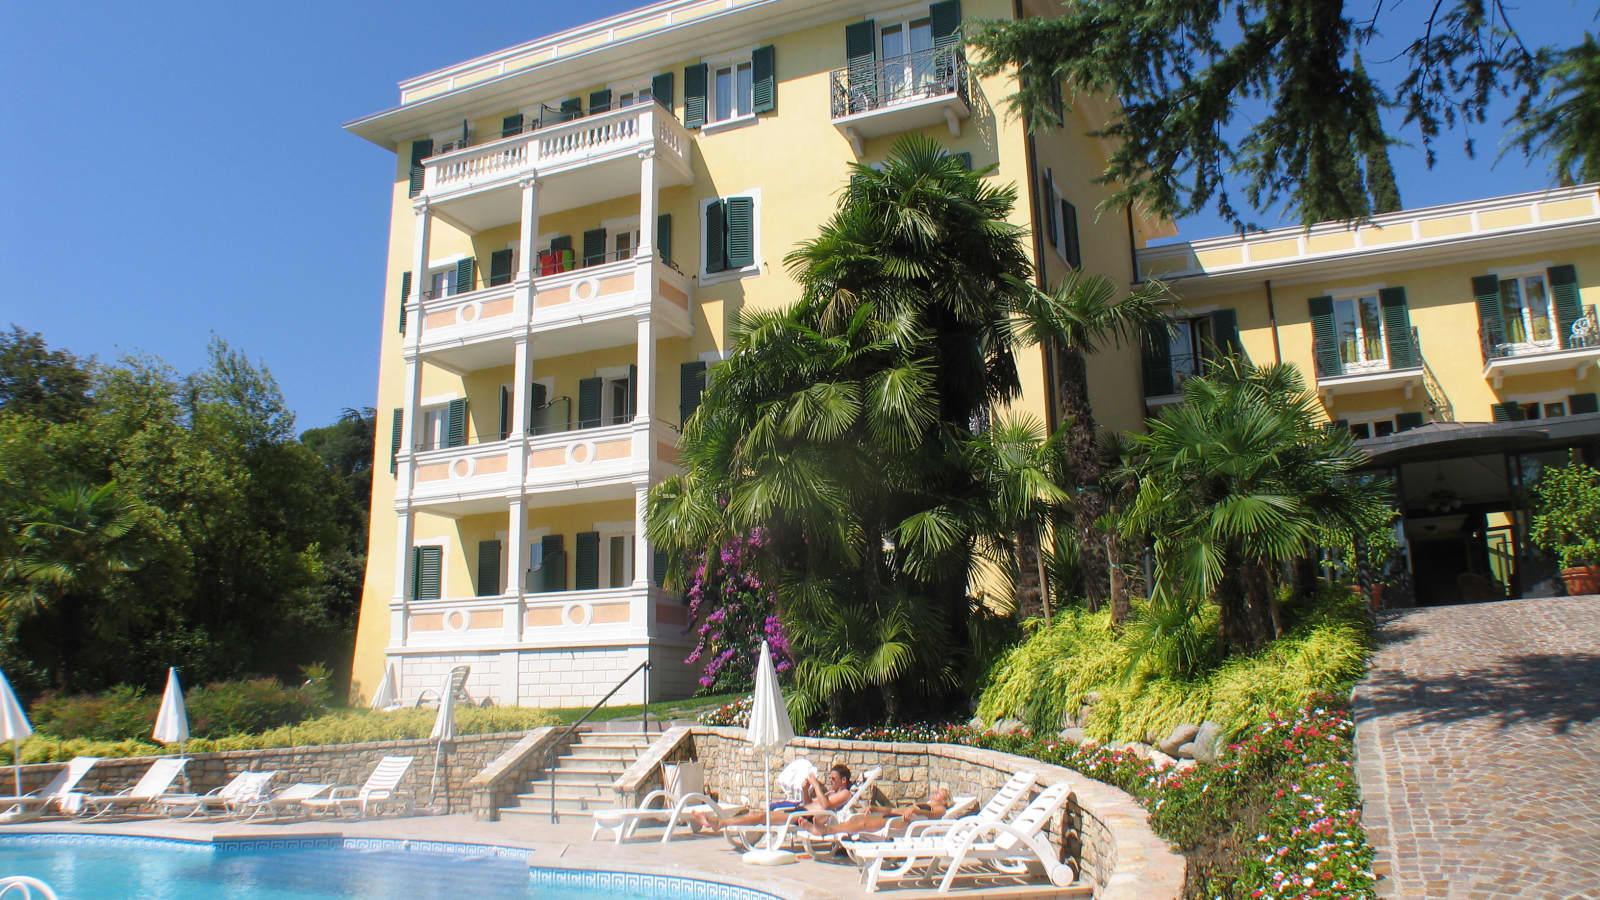 Hotel Villa Sofia Lake Garda